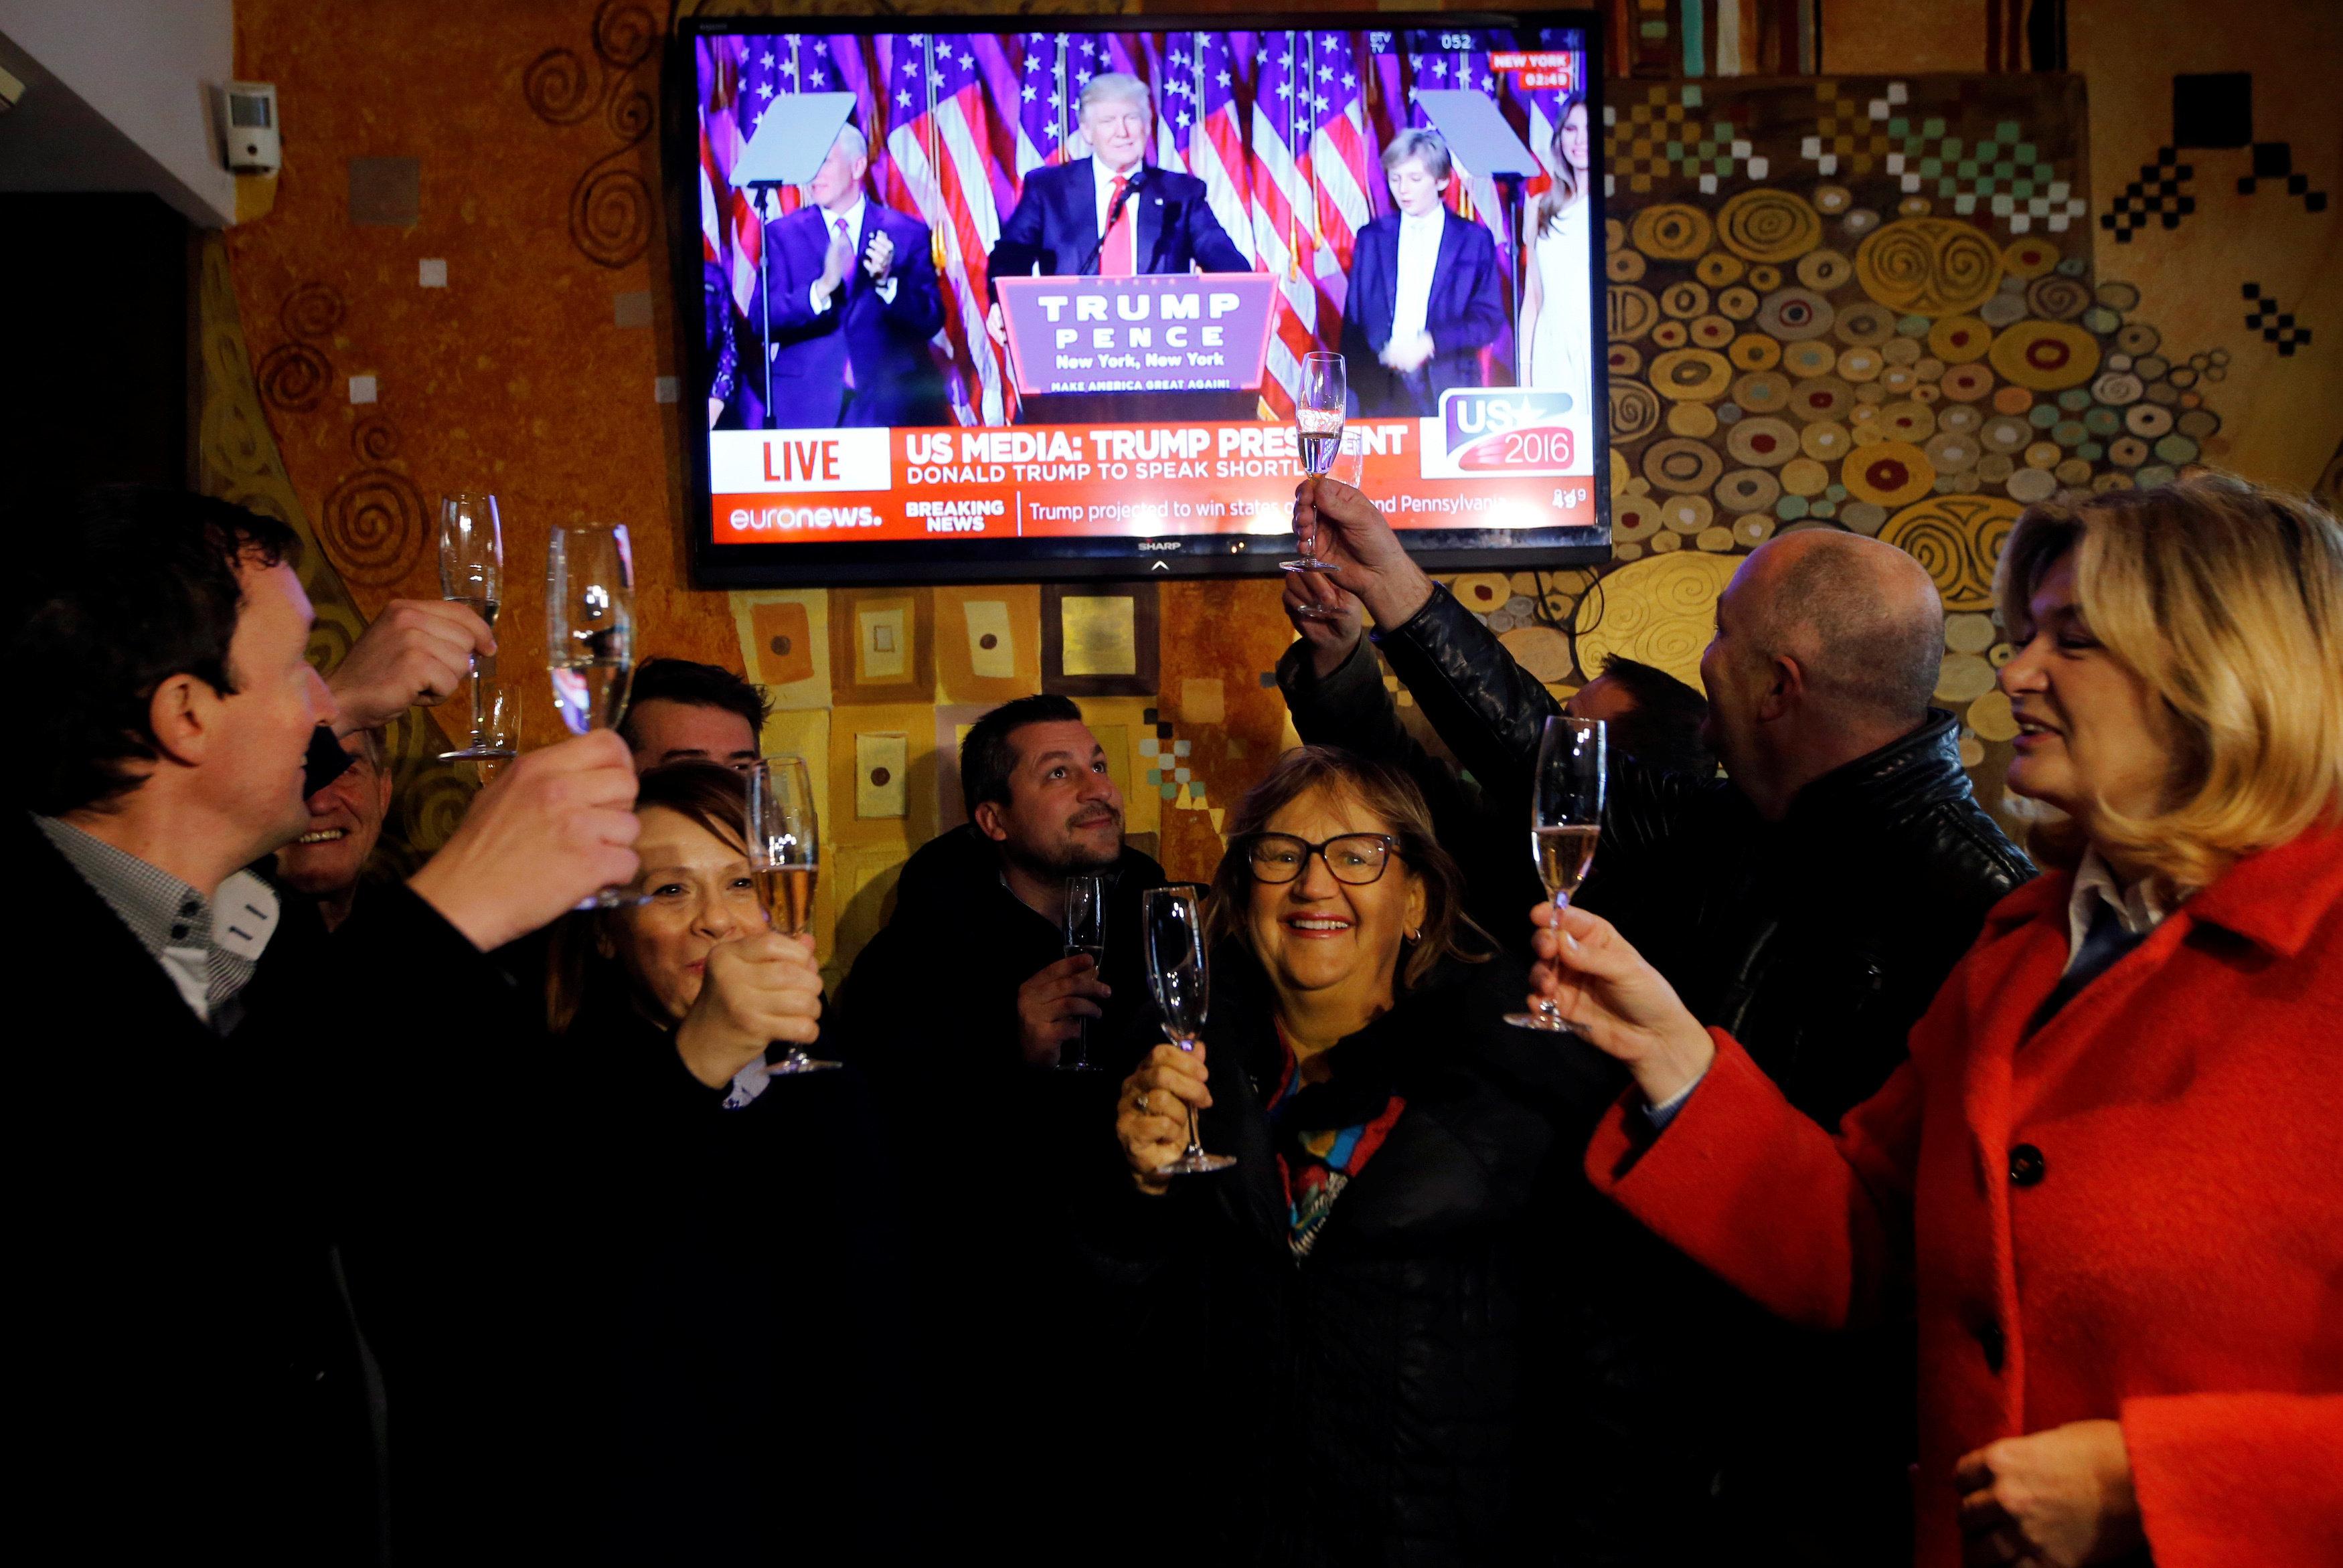 Residents celebrate during the U.S. presidential election in Melania Trump's hometown of Sevnica, Slovenia November 9, 2016. REUTERS/Srdjan Zivulovic